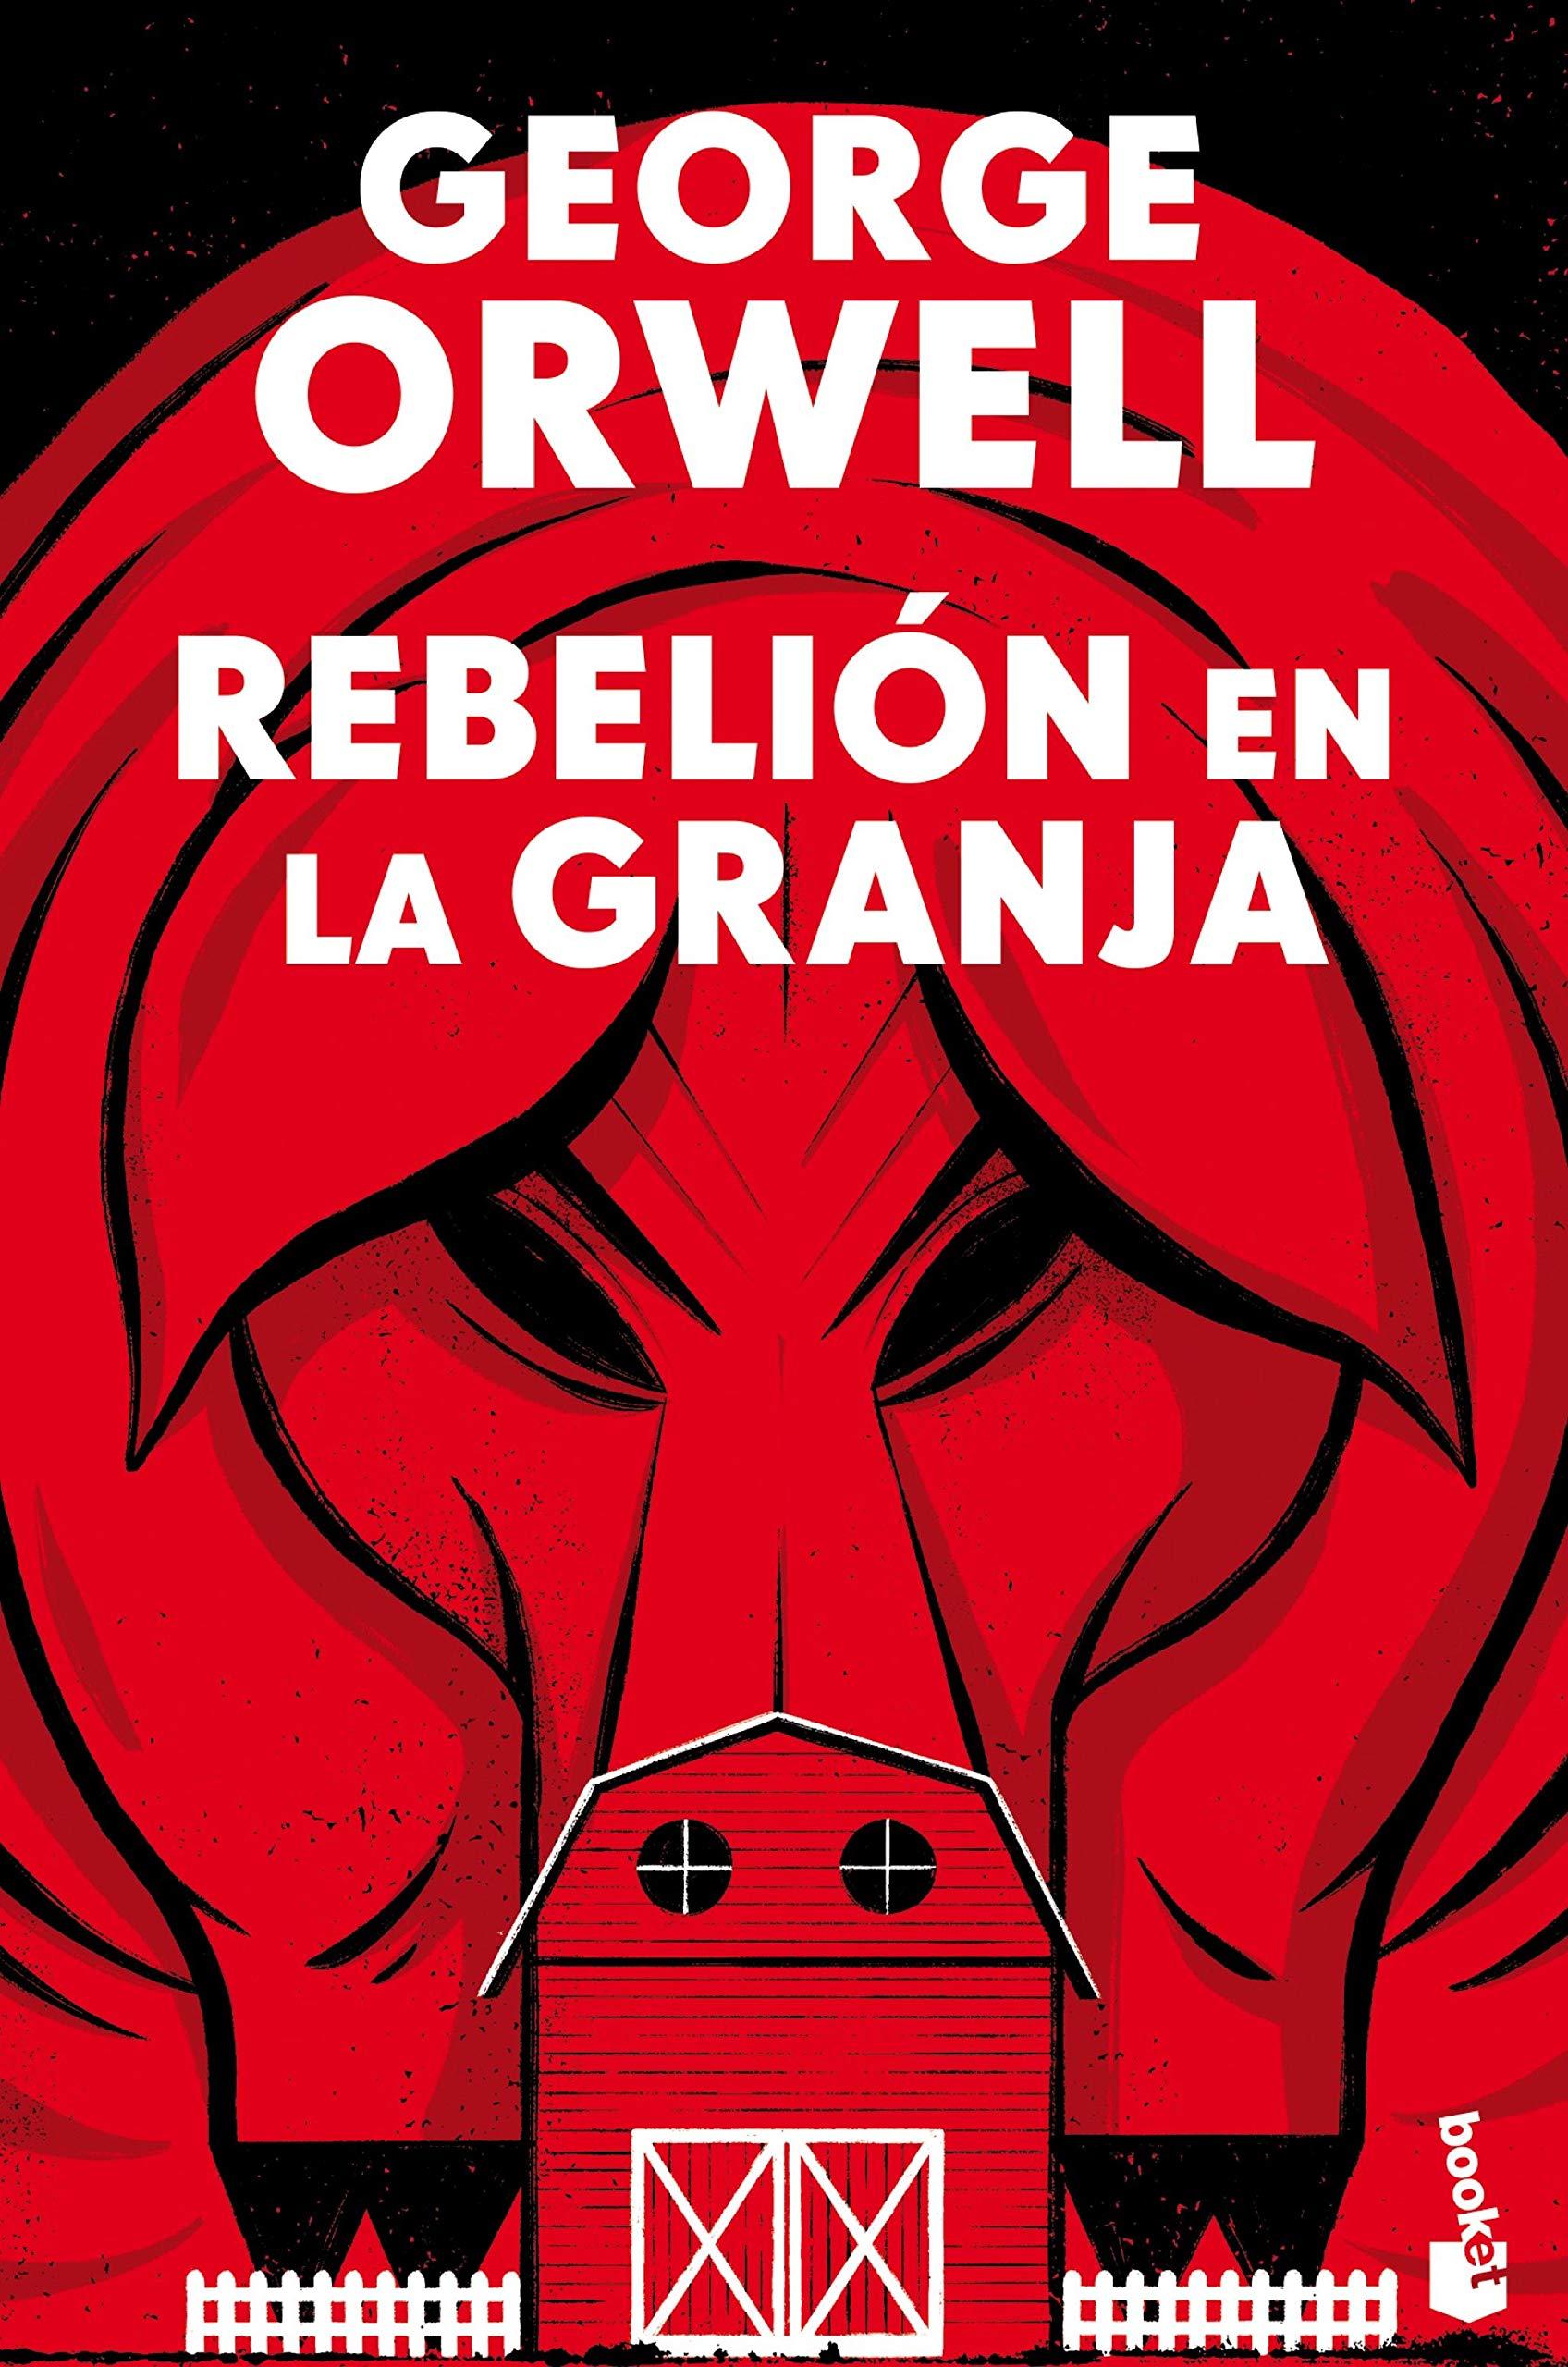 Rebelión en la granja (Novela)